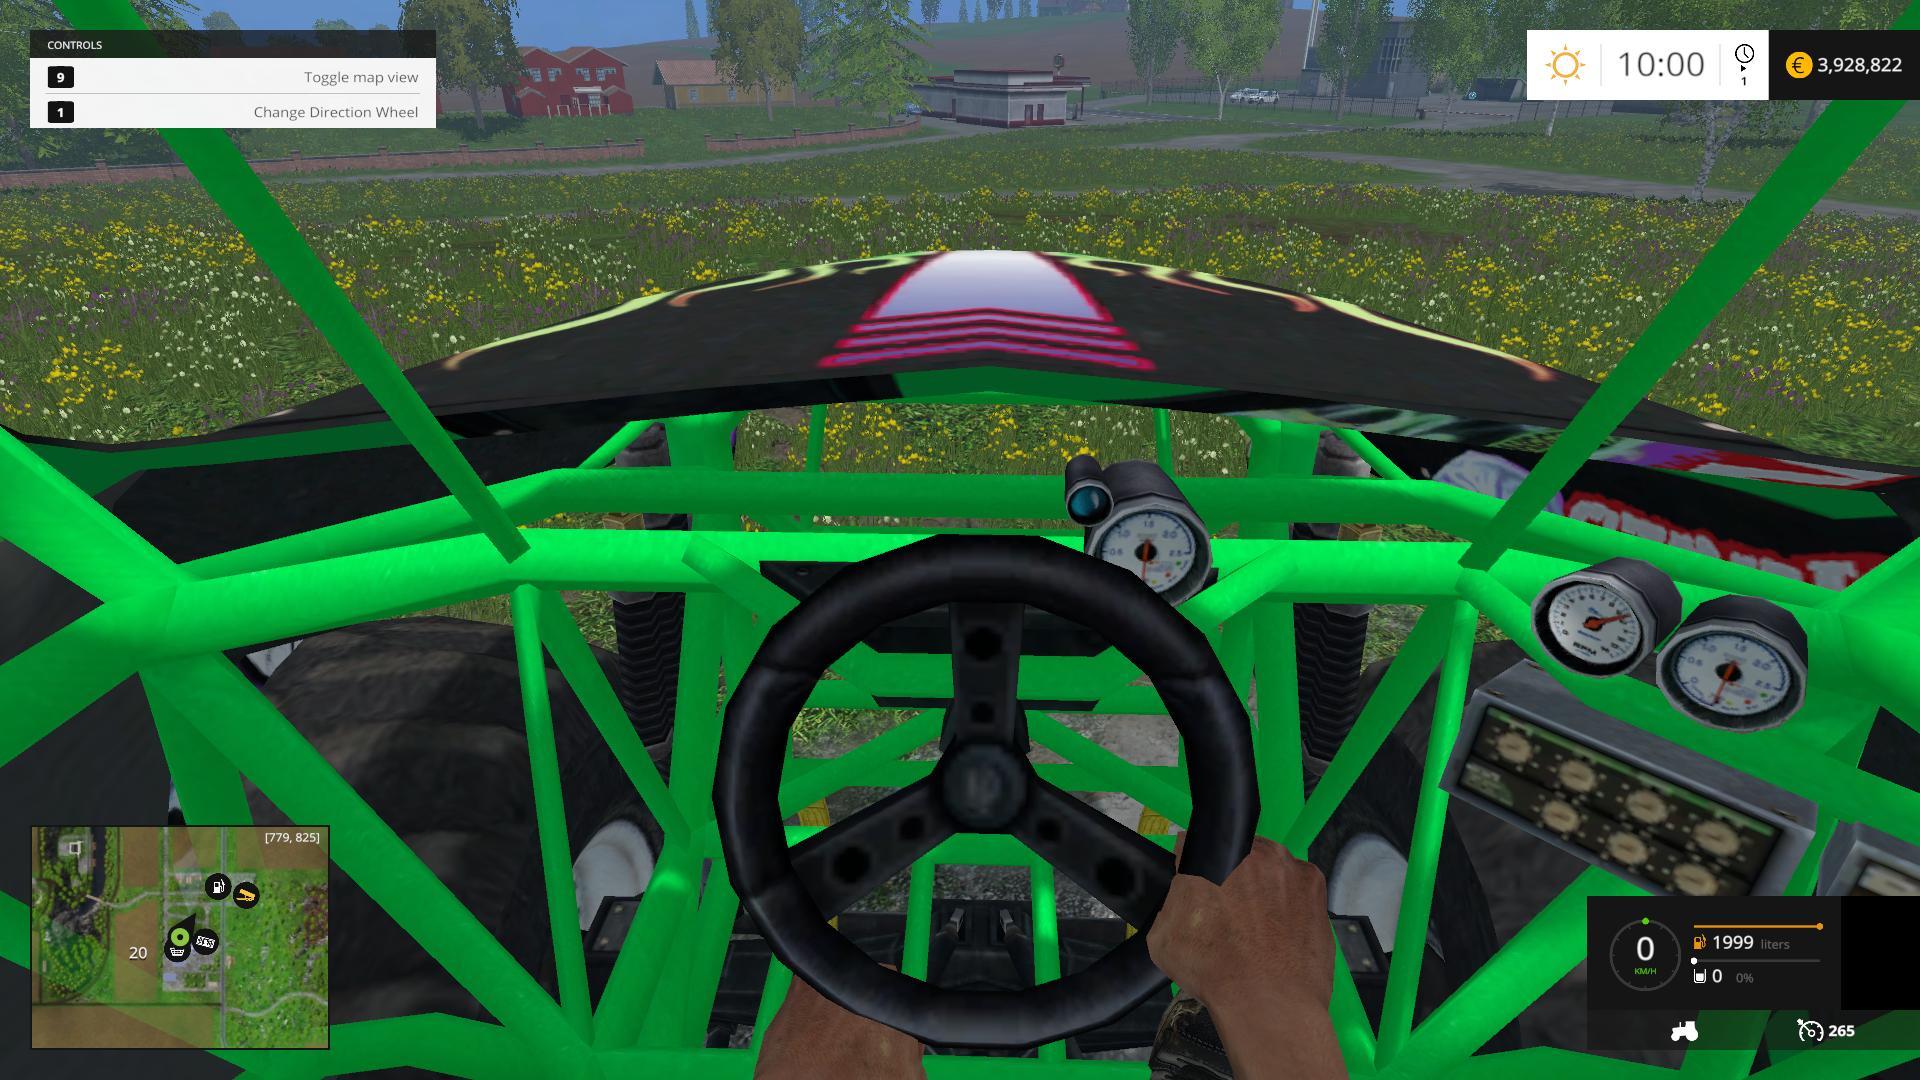 Monster Truck Fans 2015 - Farming simulator modification